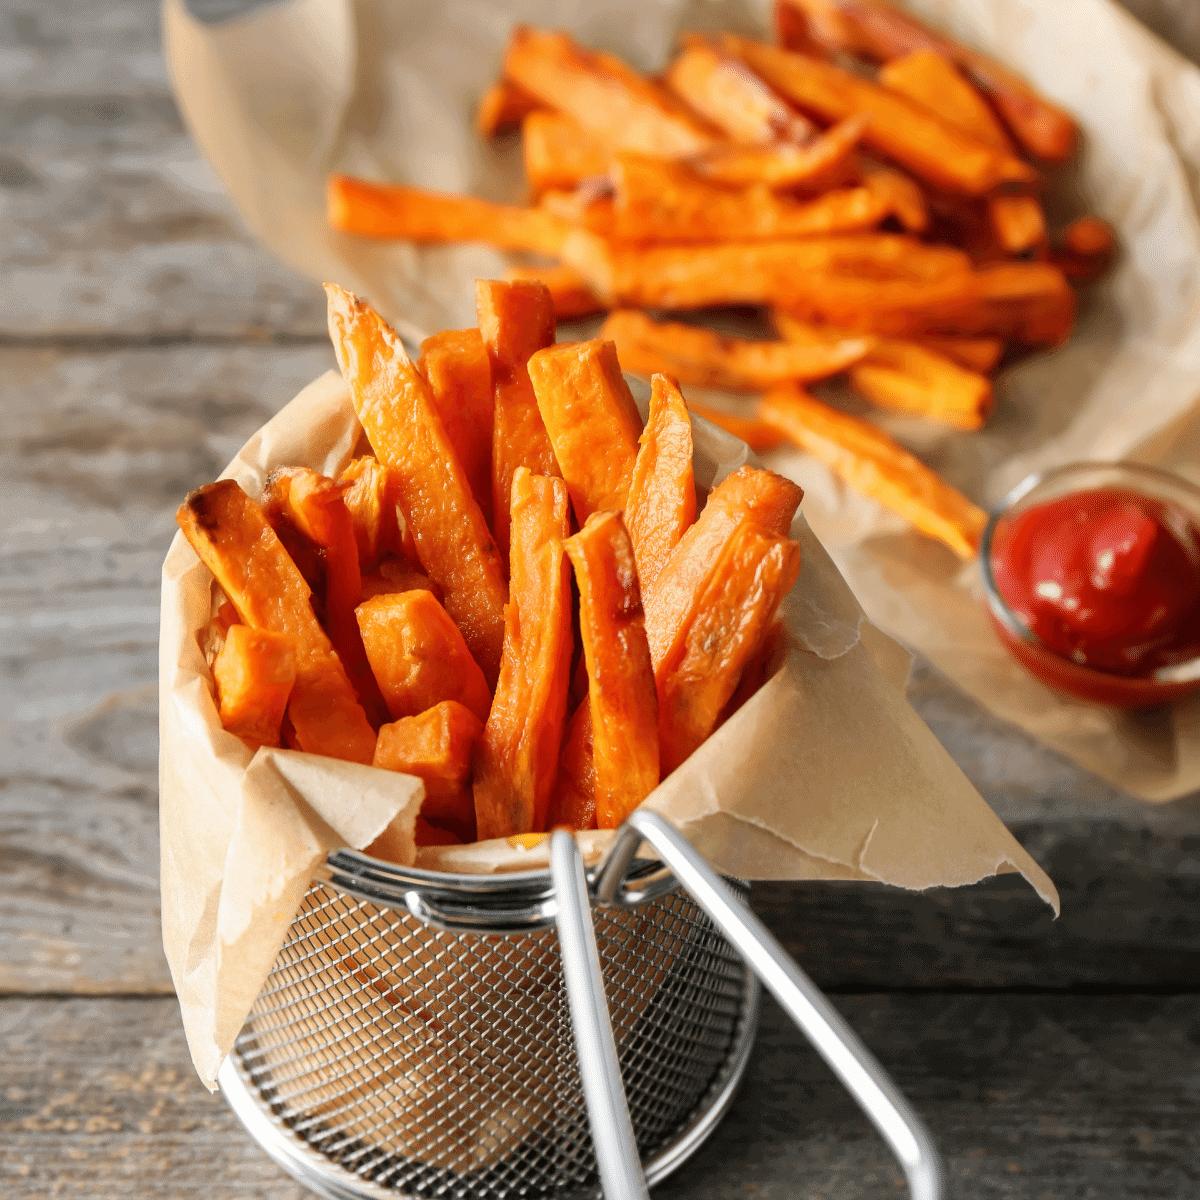 Extra crispy sweet potato fries